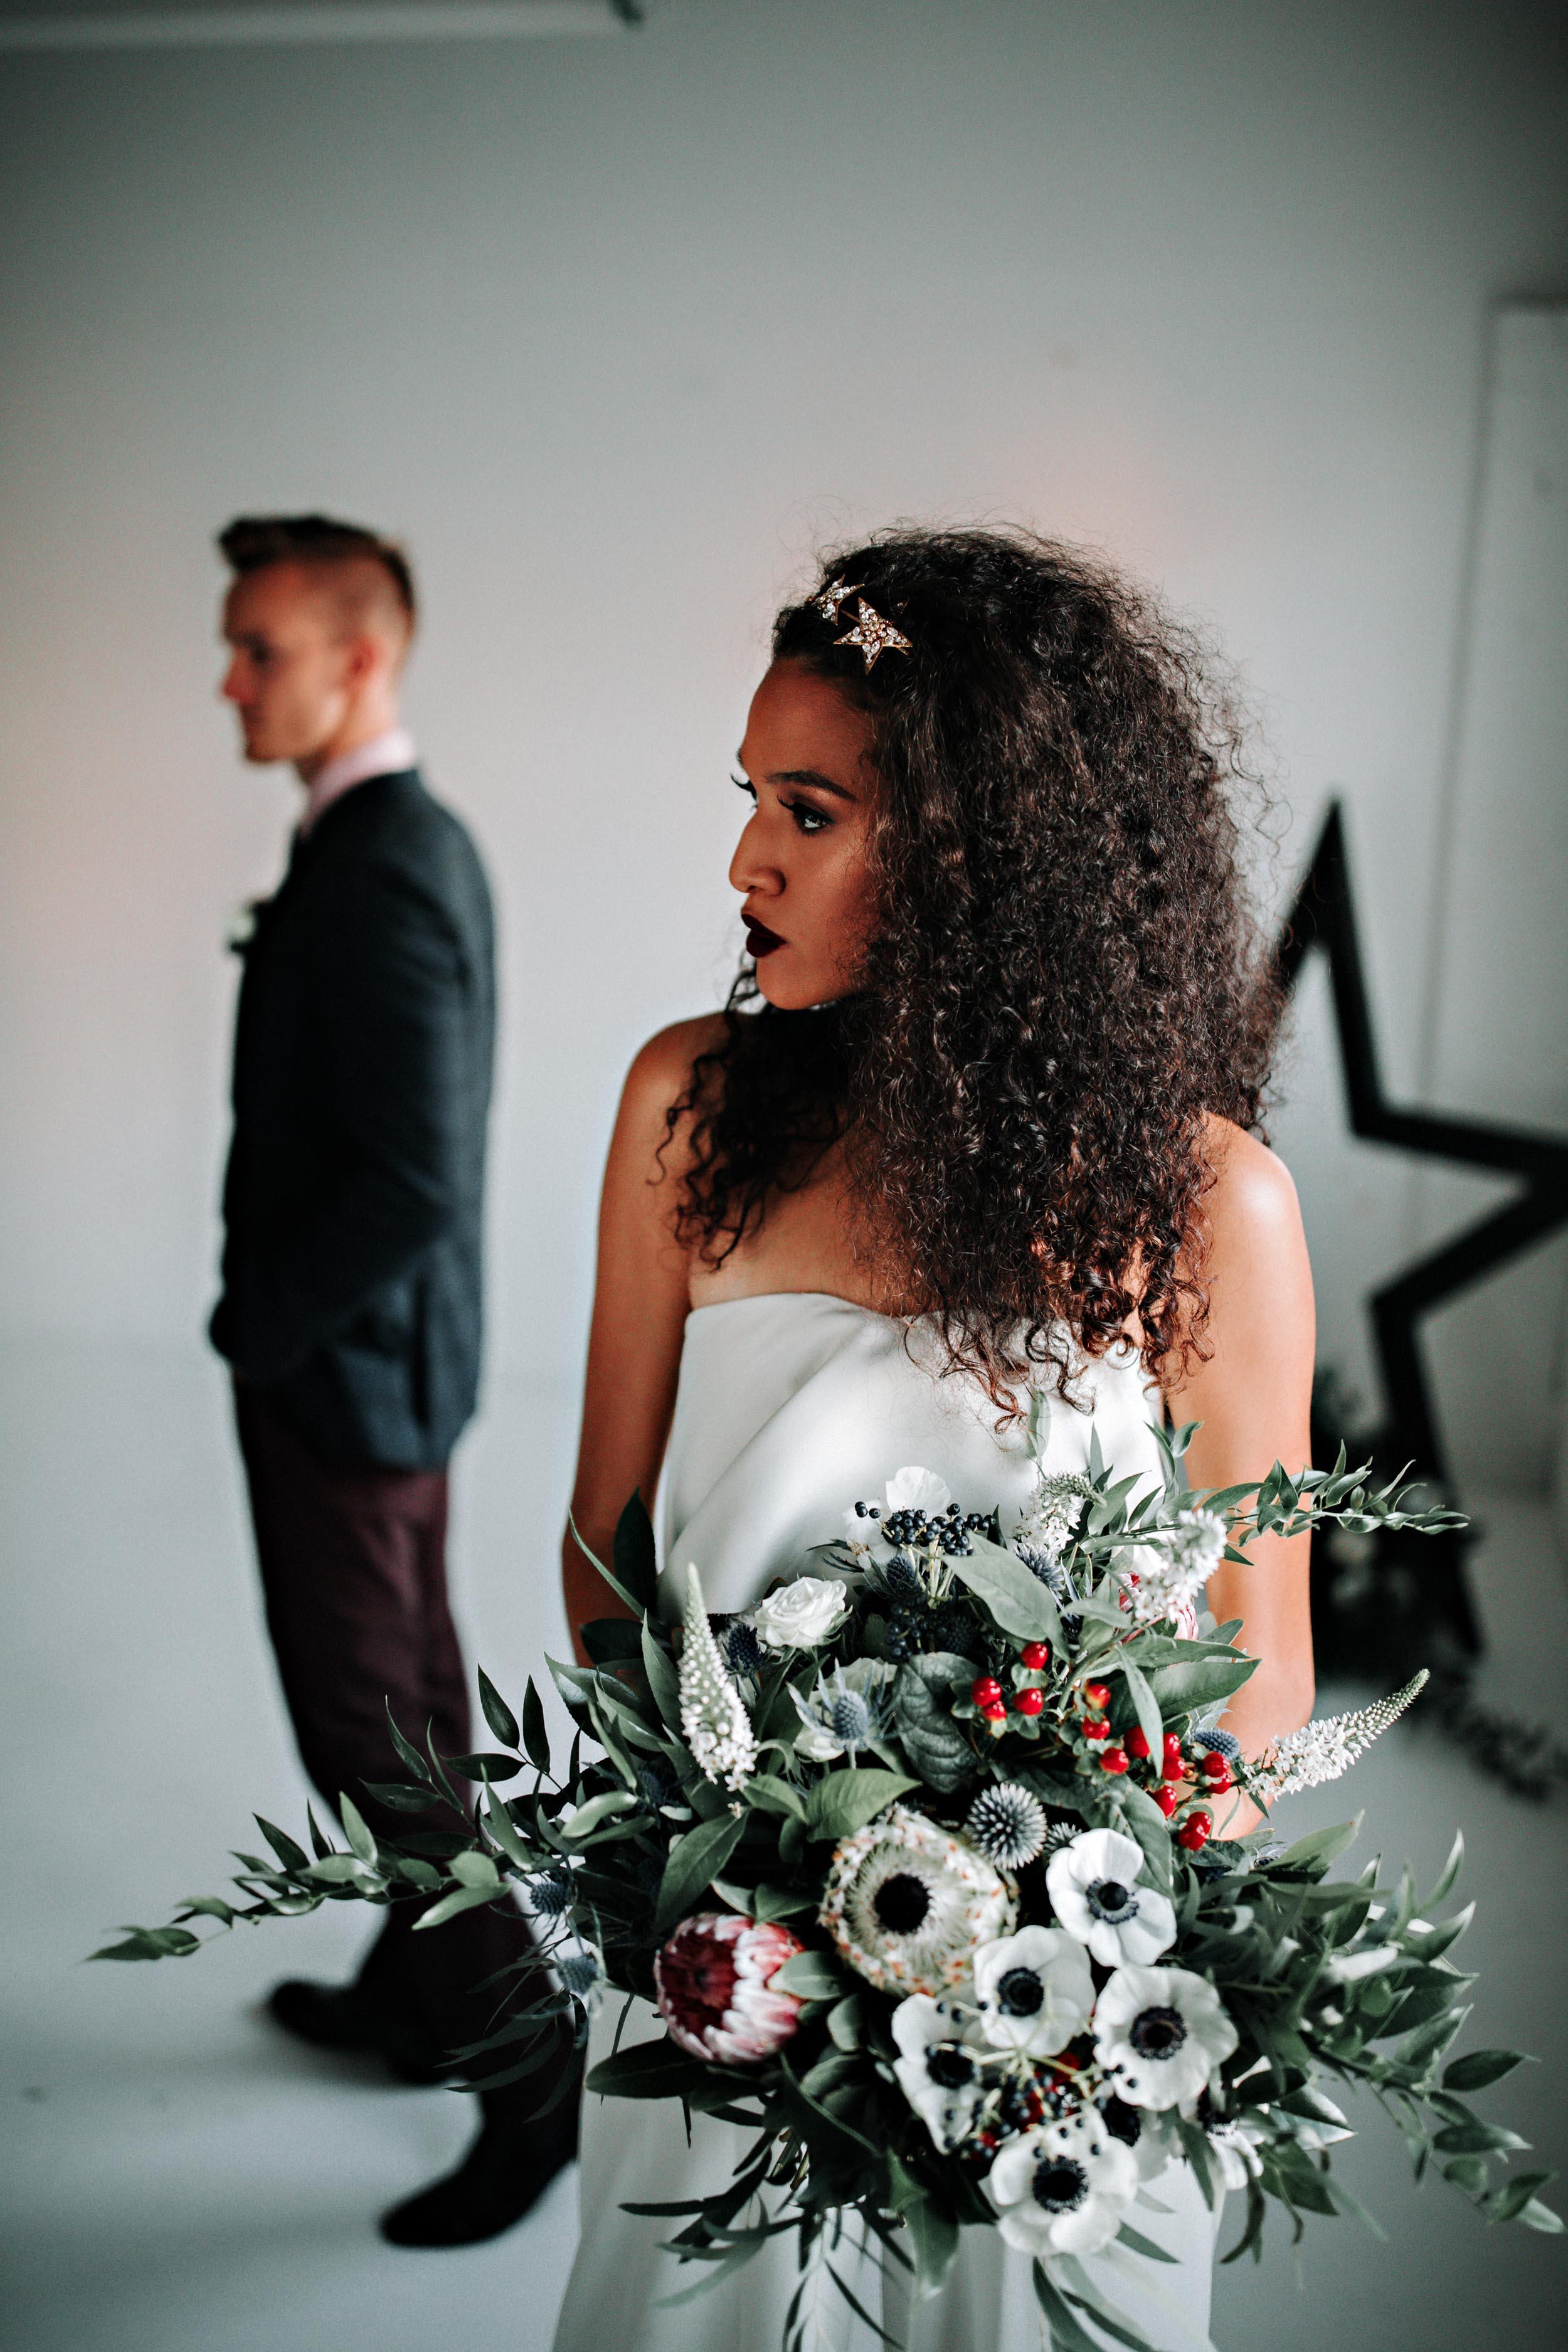 weddings-starsstripes-04.jpg